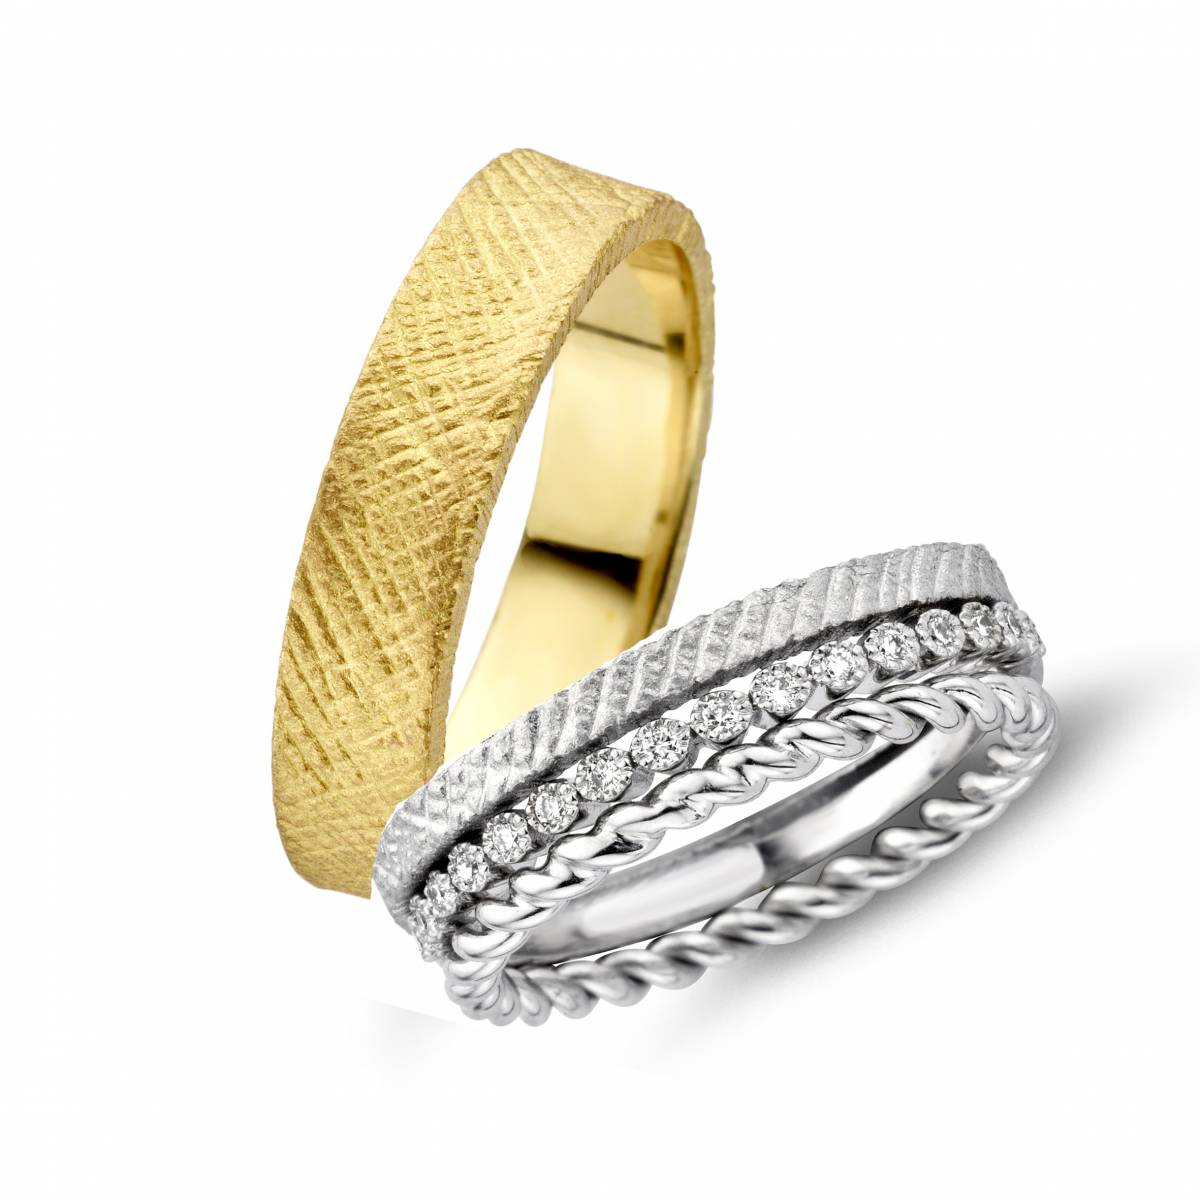 Juwelier Vandromme - Juwelen - Trouwring - Verlovingsring – House of Weddings - 14